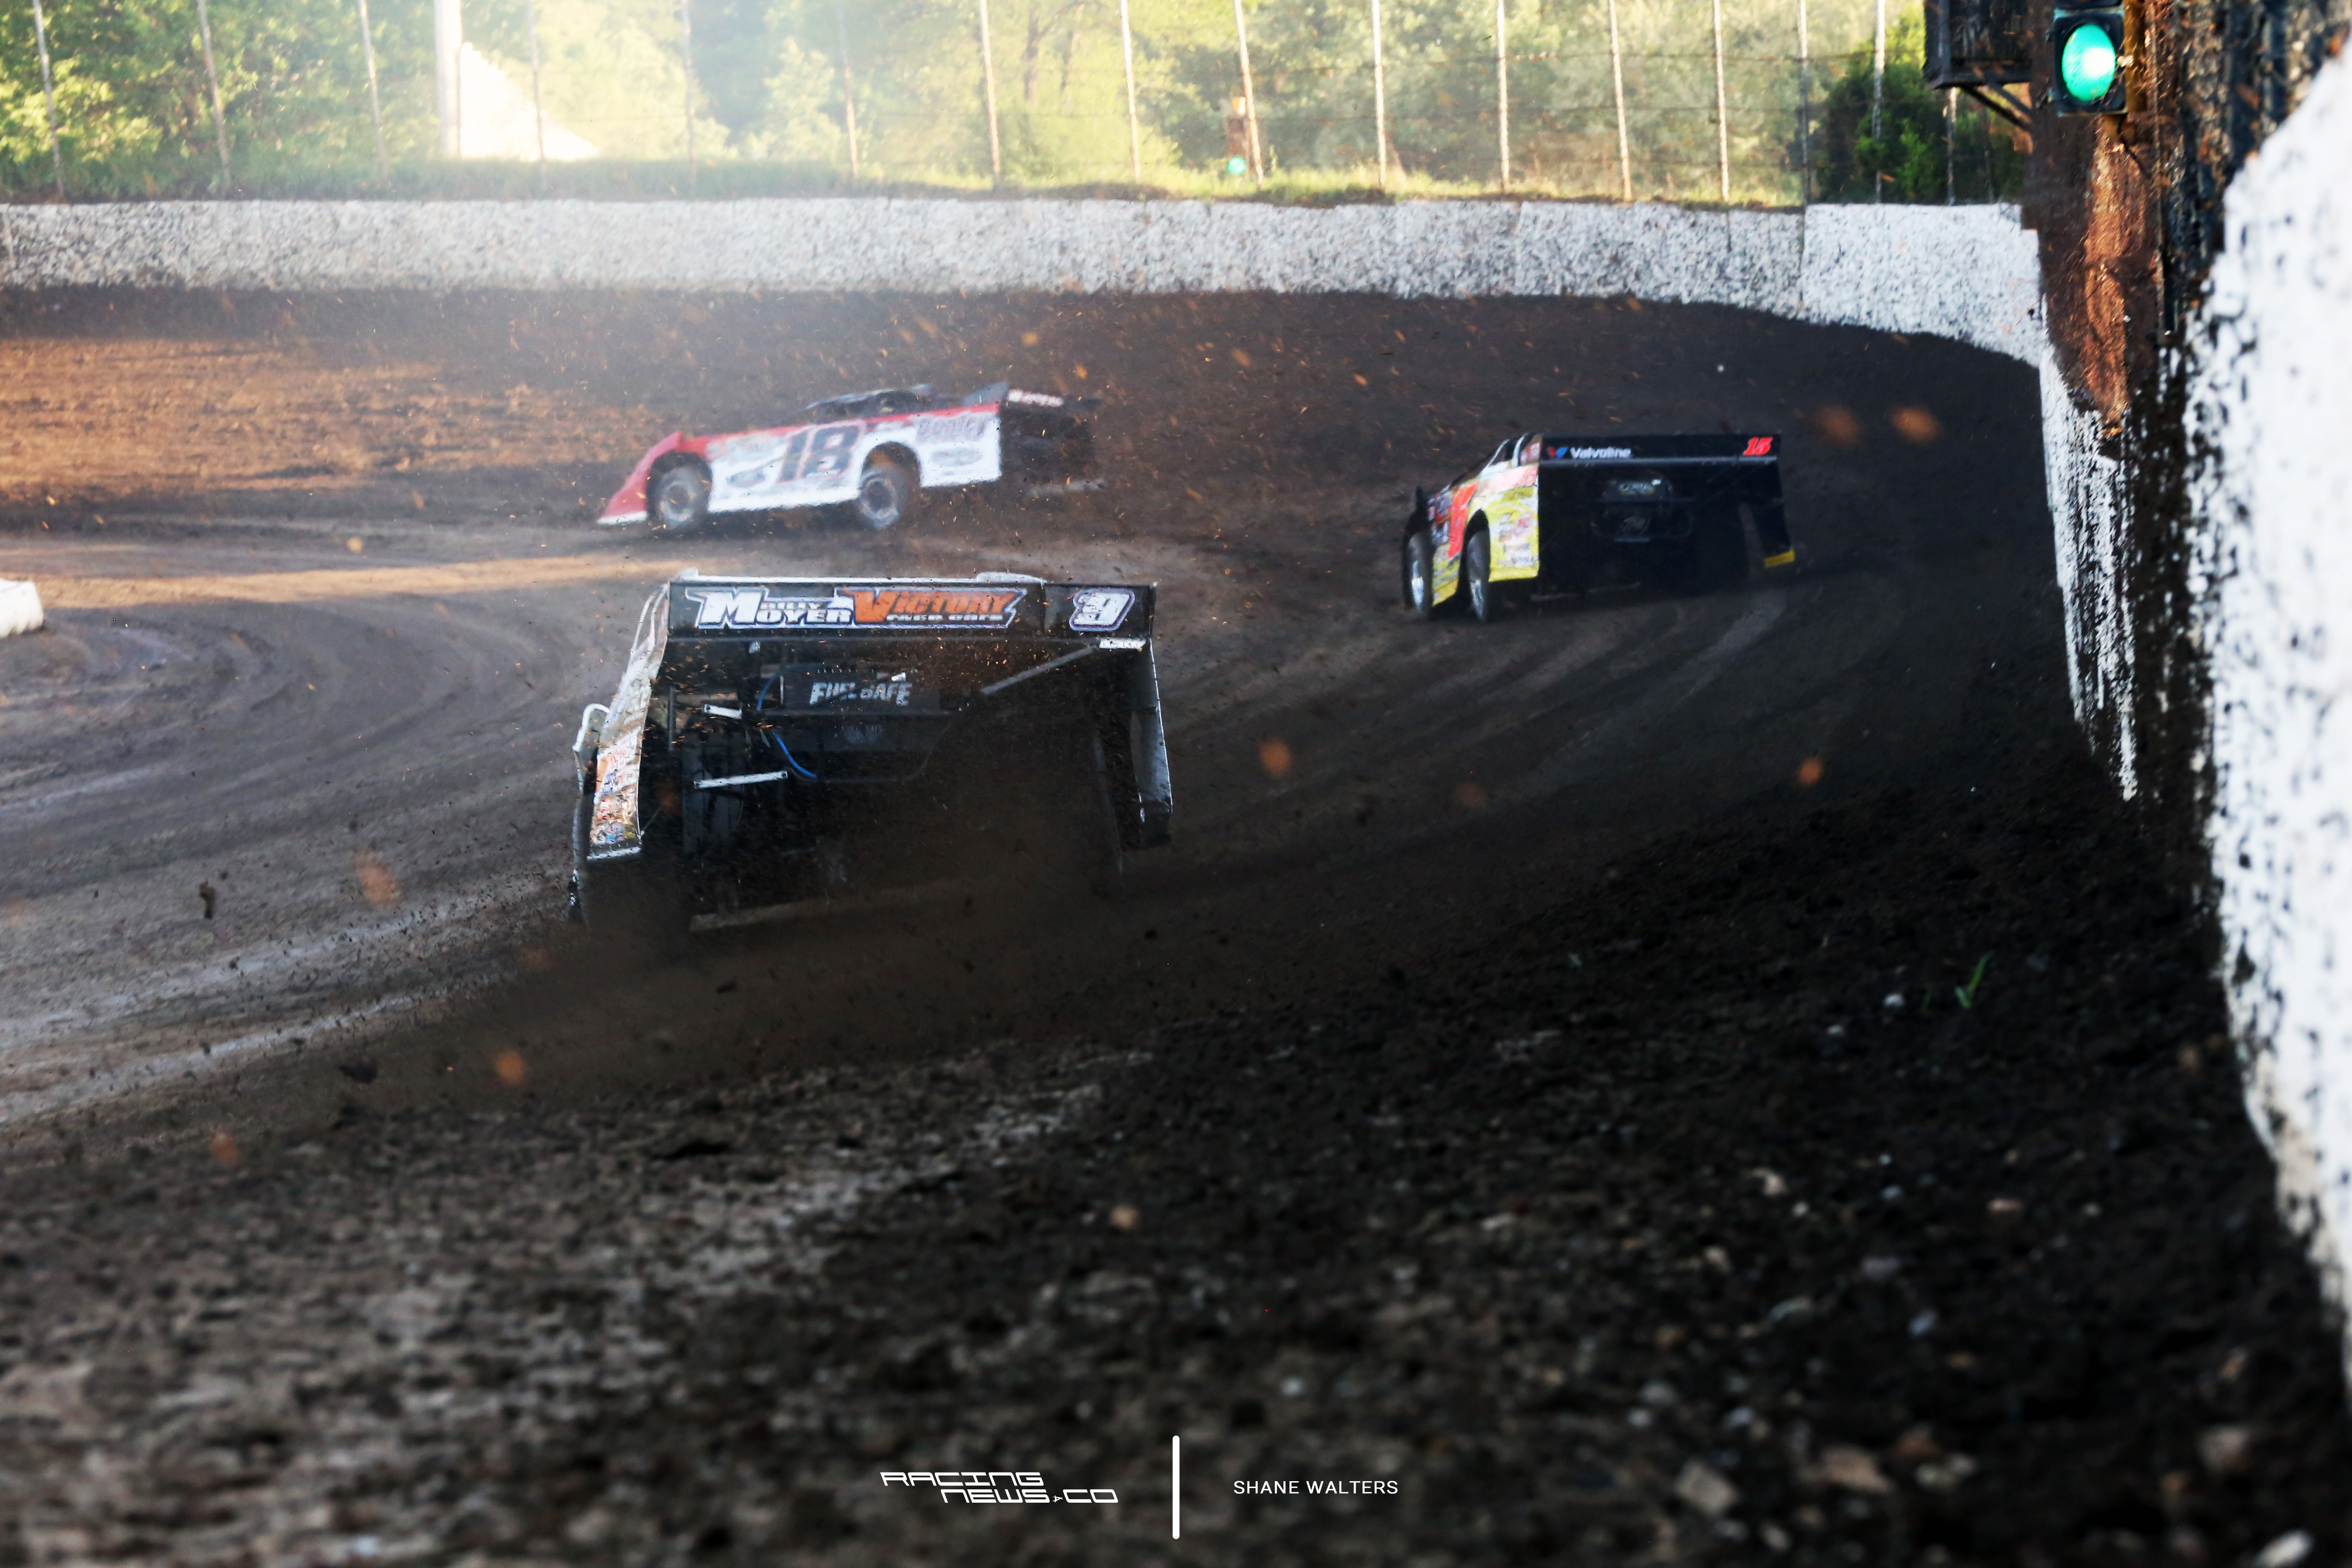 LaSalle Speedway Dirt Racing Photos 6369